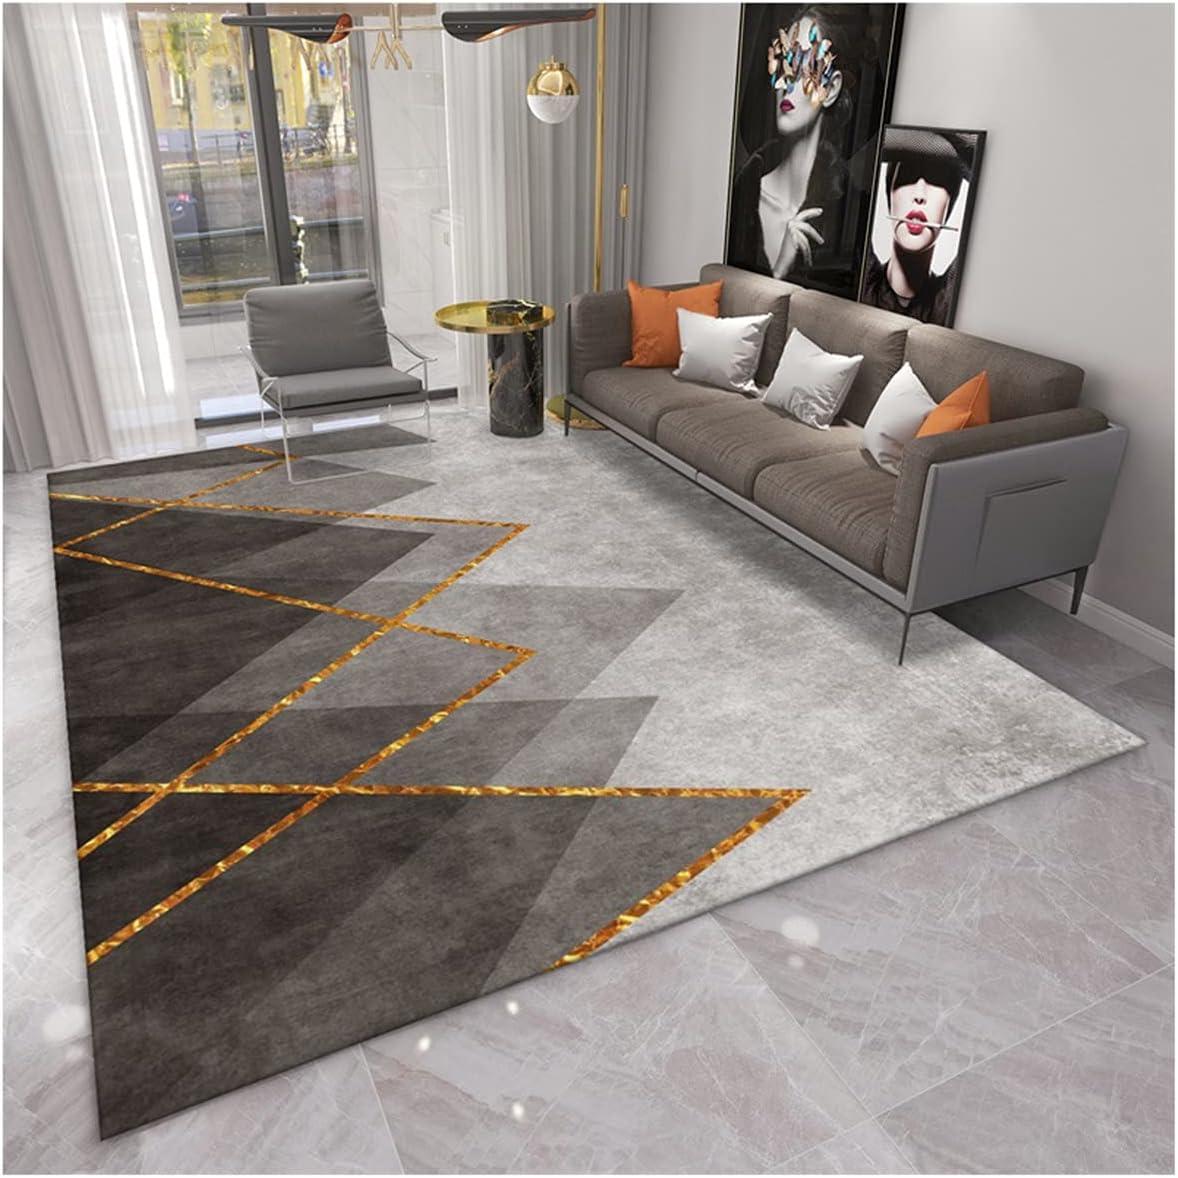 Area Surprise price Rug, Abstract Geometric Luxury Bargain Lounge Ru Living Room